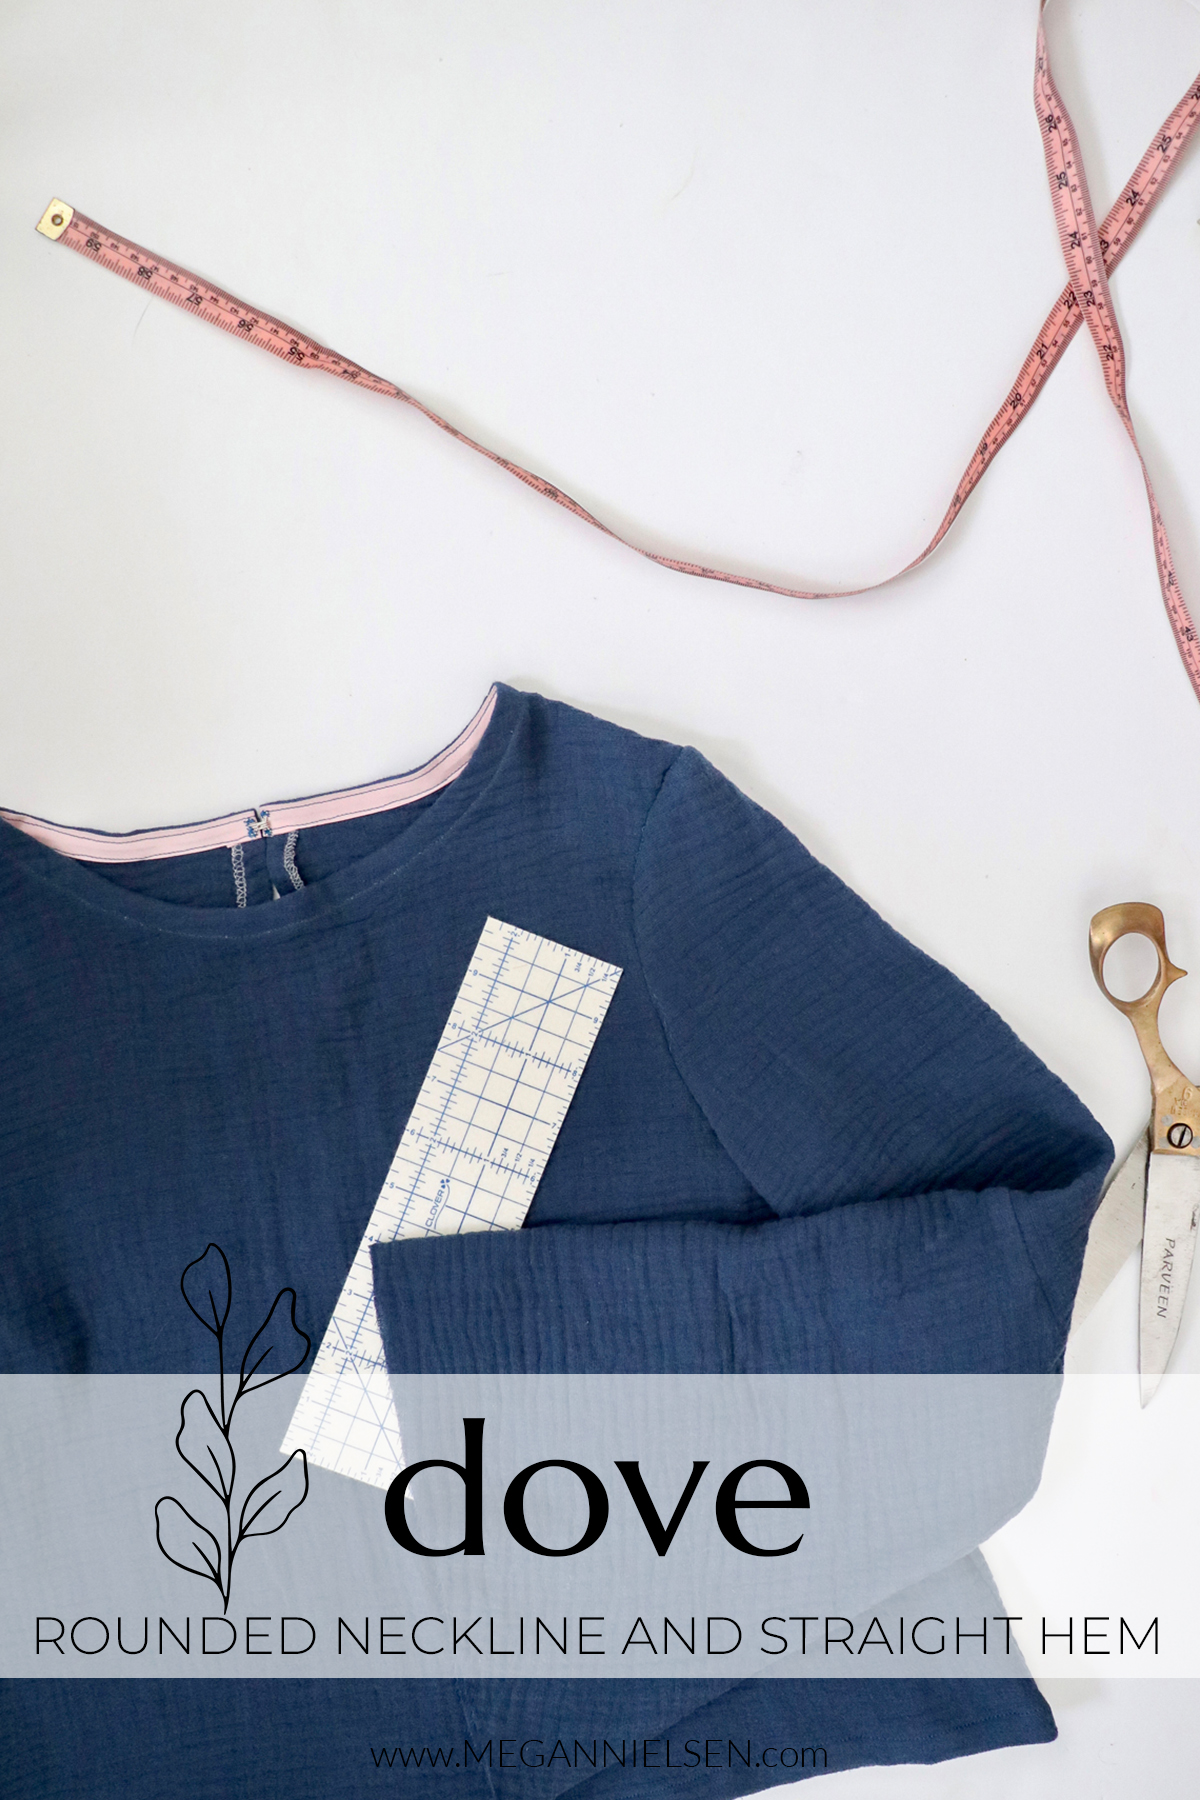 Dove sewalong rounded neckline and straight hem variation